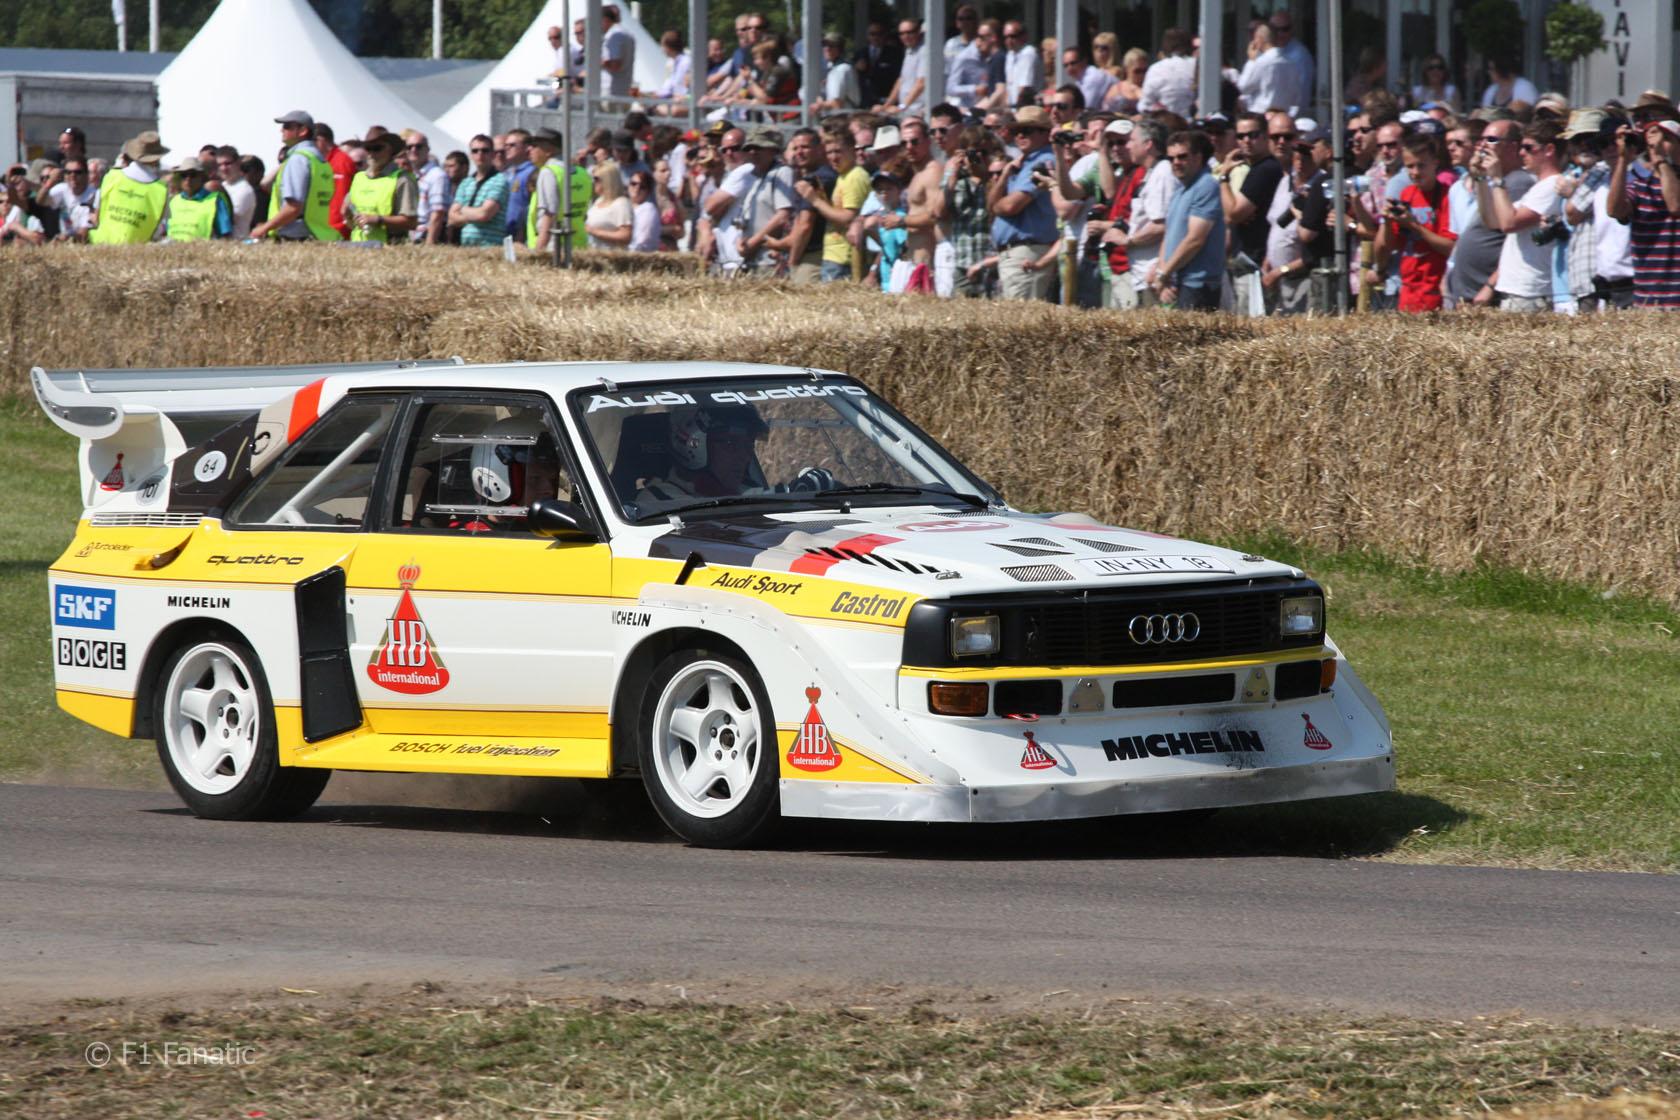 Used 2009 Audi A8 For Sale  CarGurus